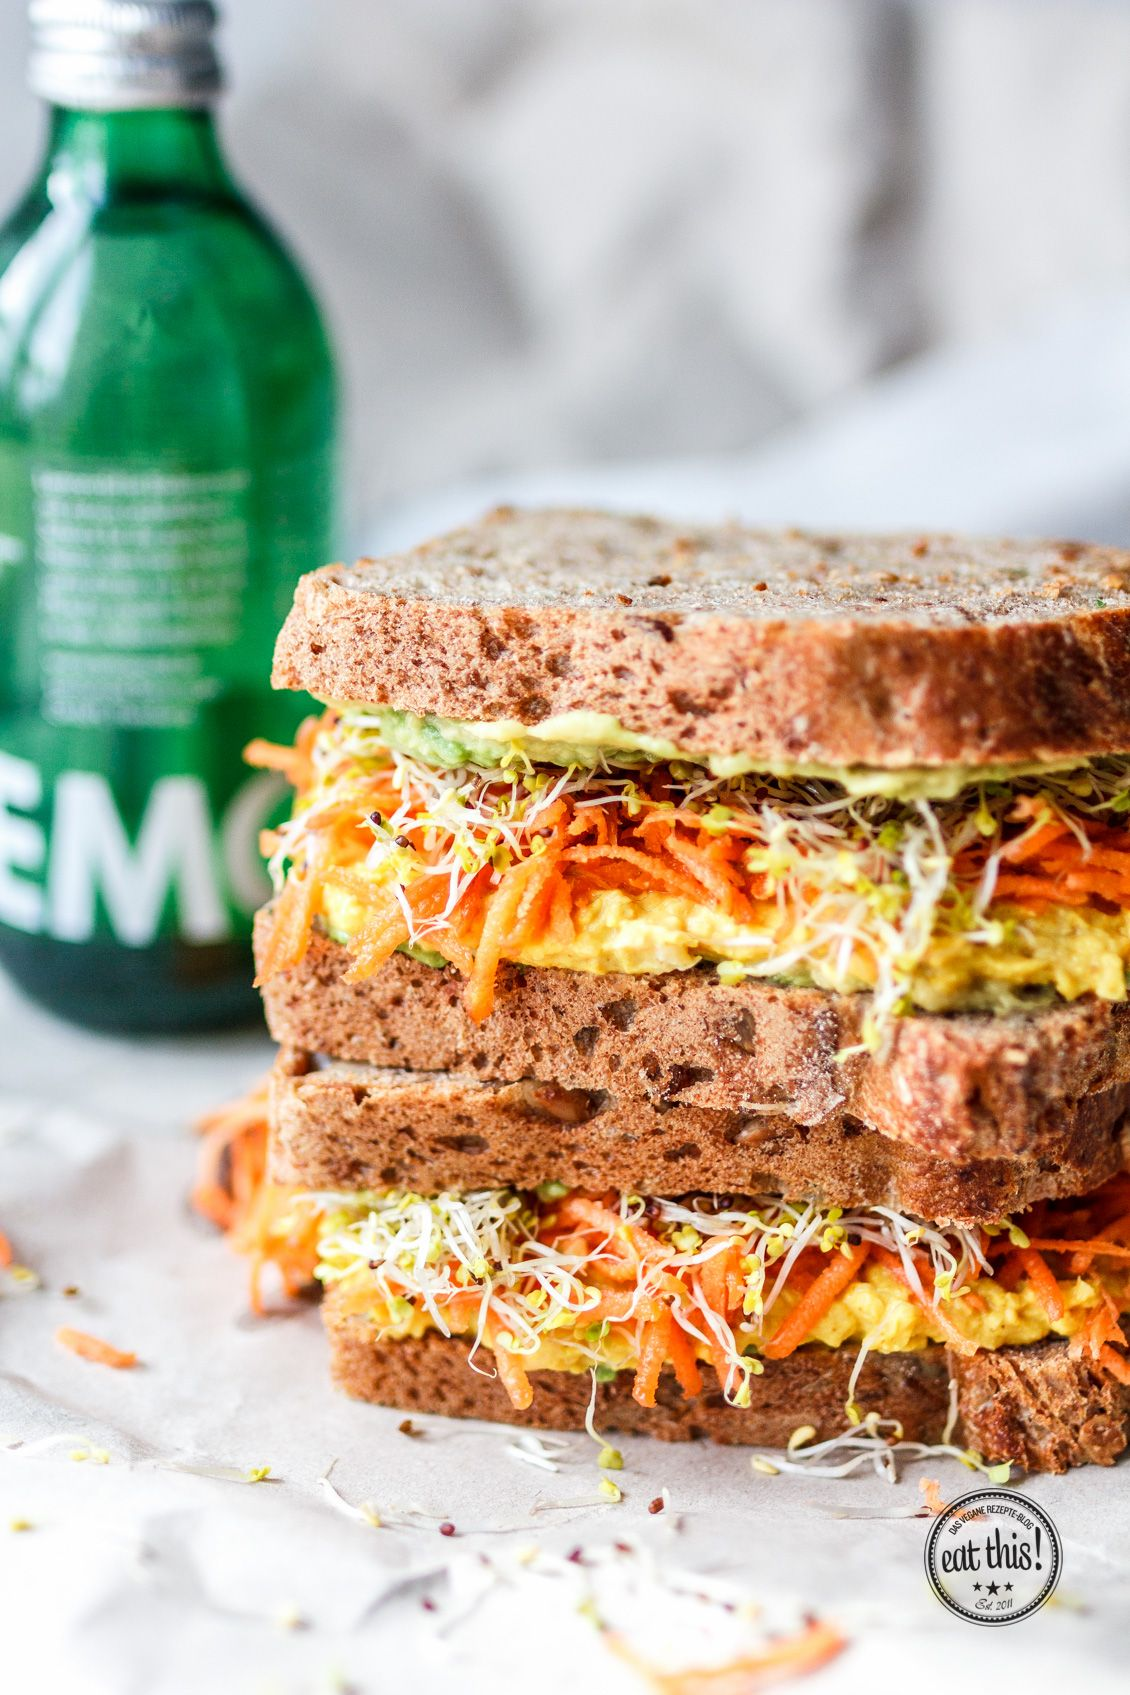 Vollkornsandwich mit Kurkuma-Currysalat & 24h in Antwerpen · Eat this! Foodblog • Vegane Rezepte • Stories